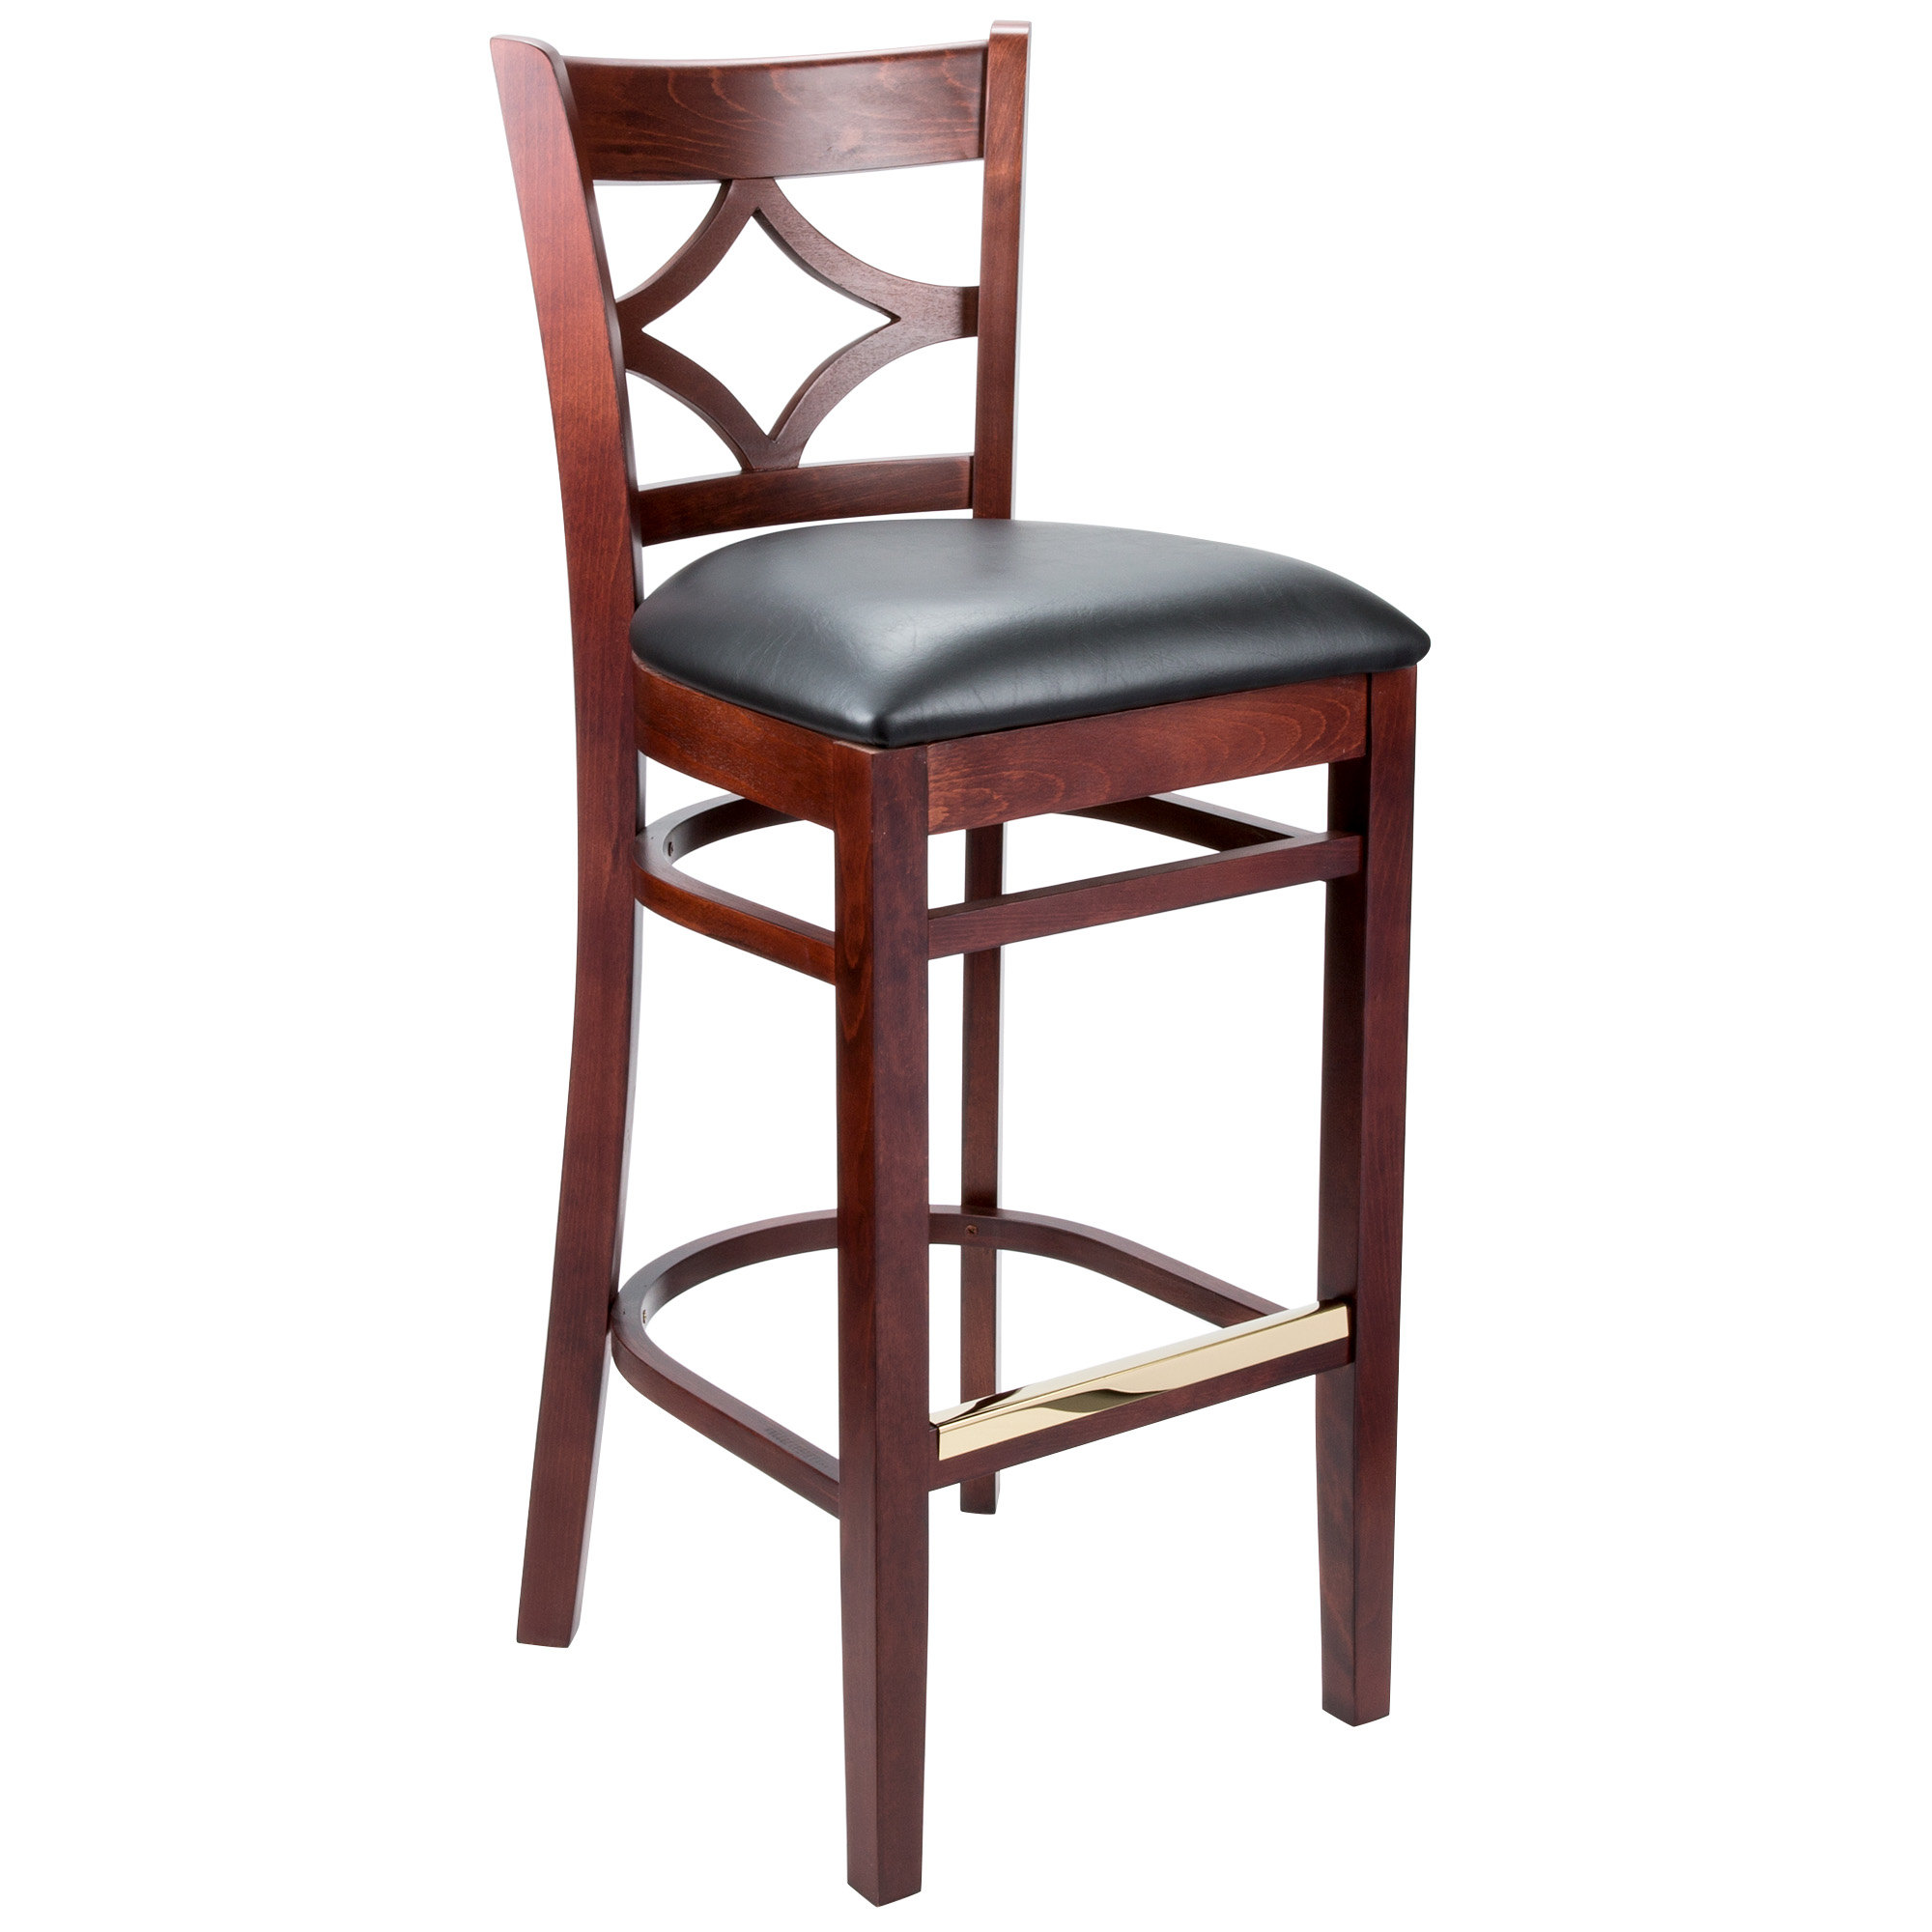 #68 - Mahogany Wood Finished Diamond Back Restaurant Barstool with Black Vinyl Seat